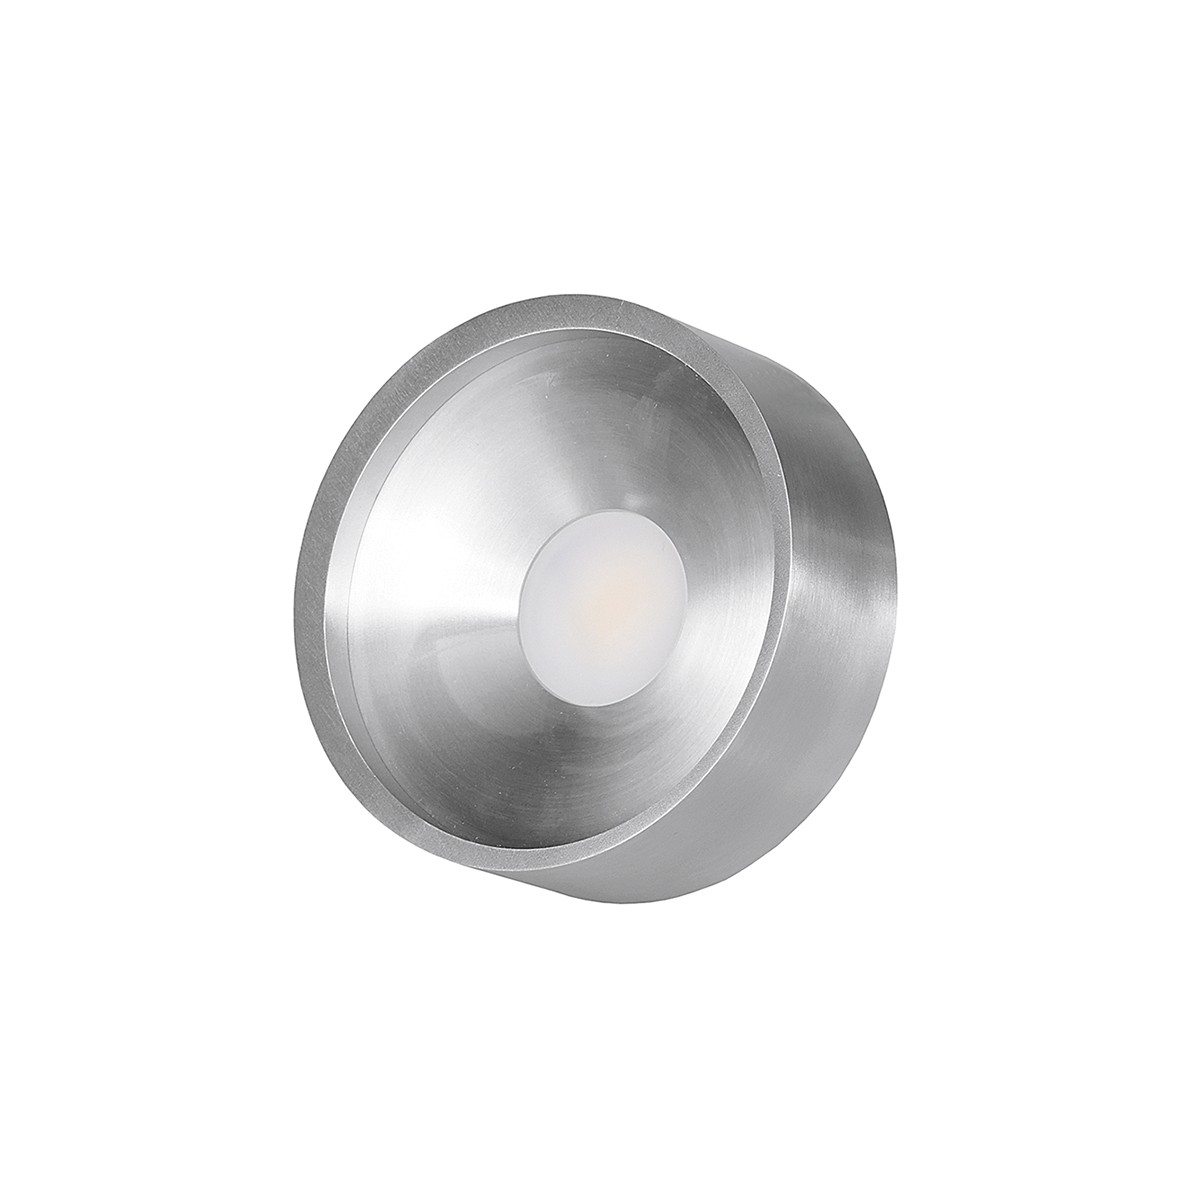 MyLight Orlando LED Deckenstrahler, Aluminium